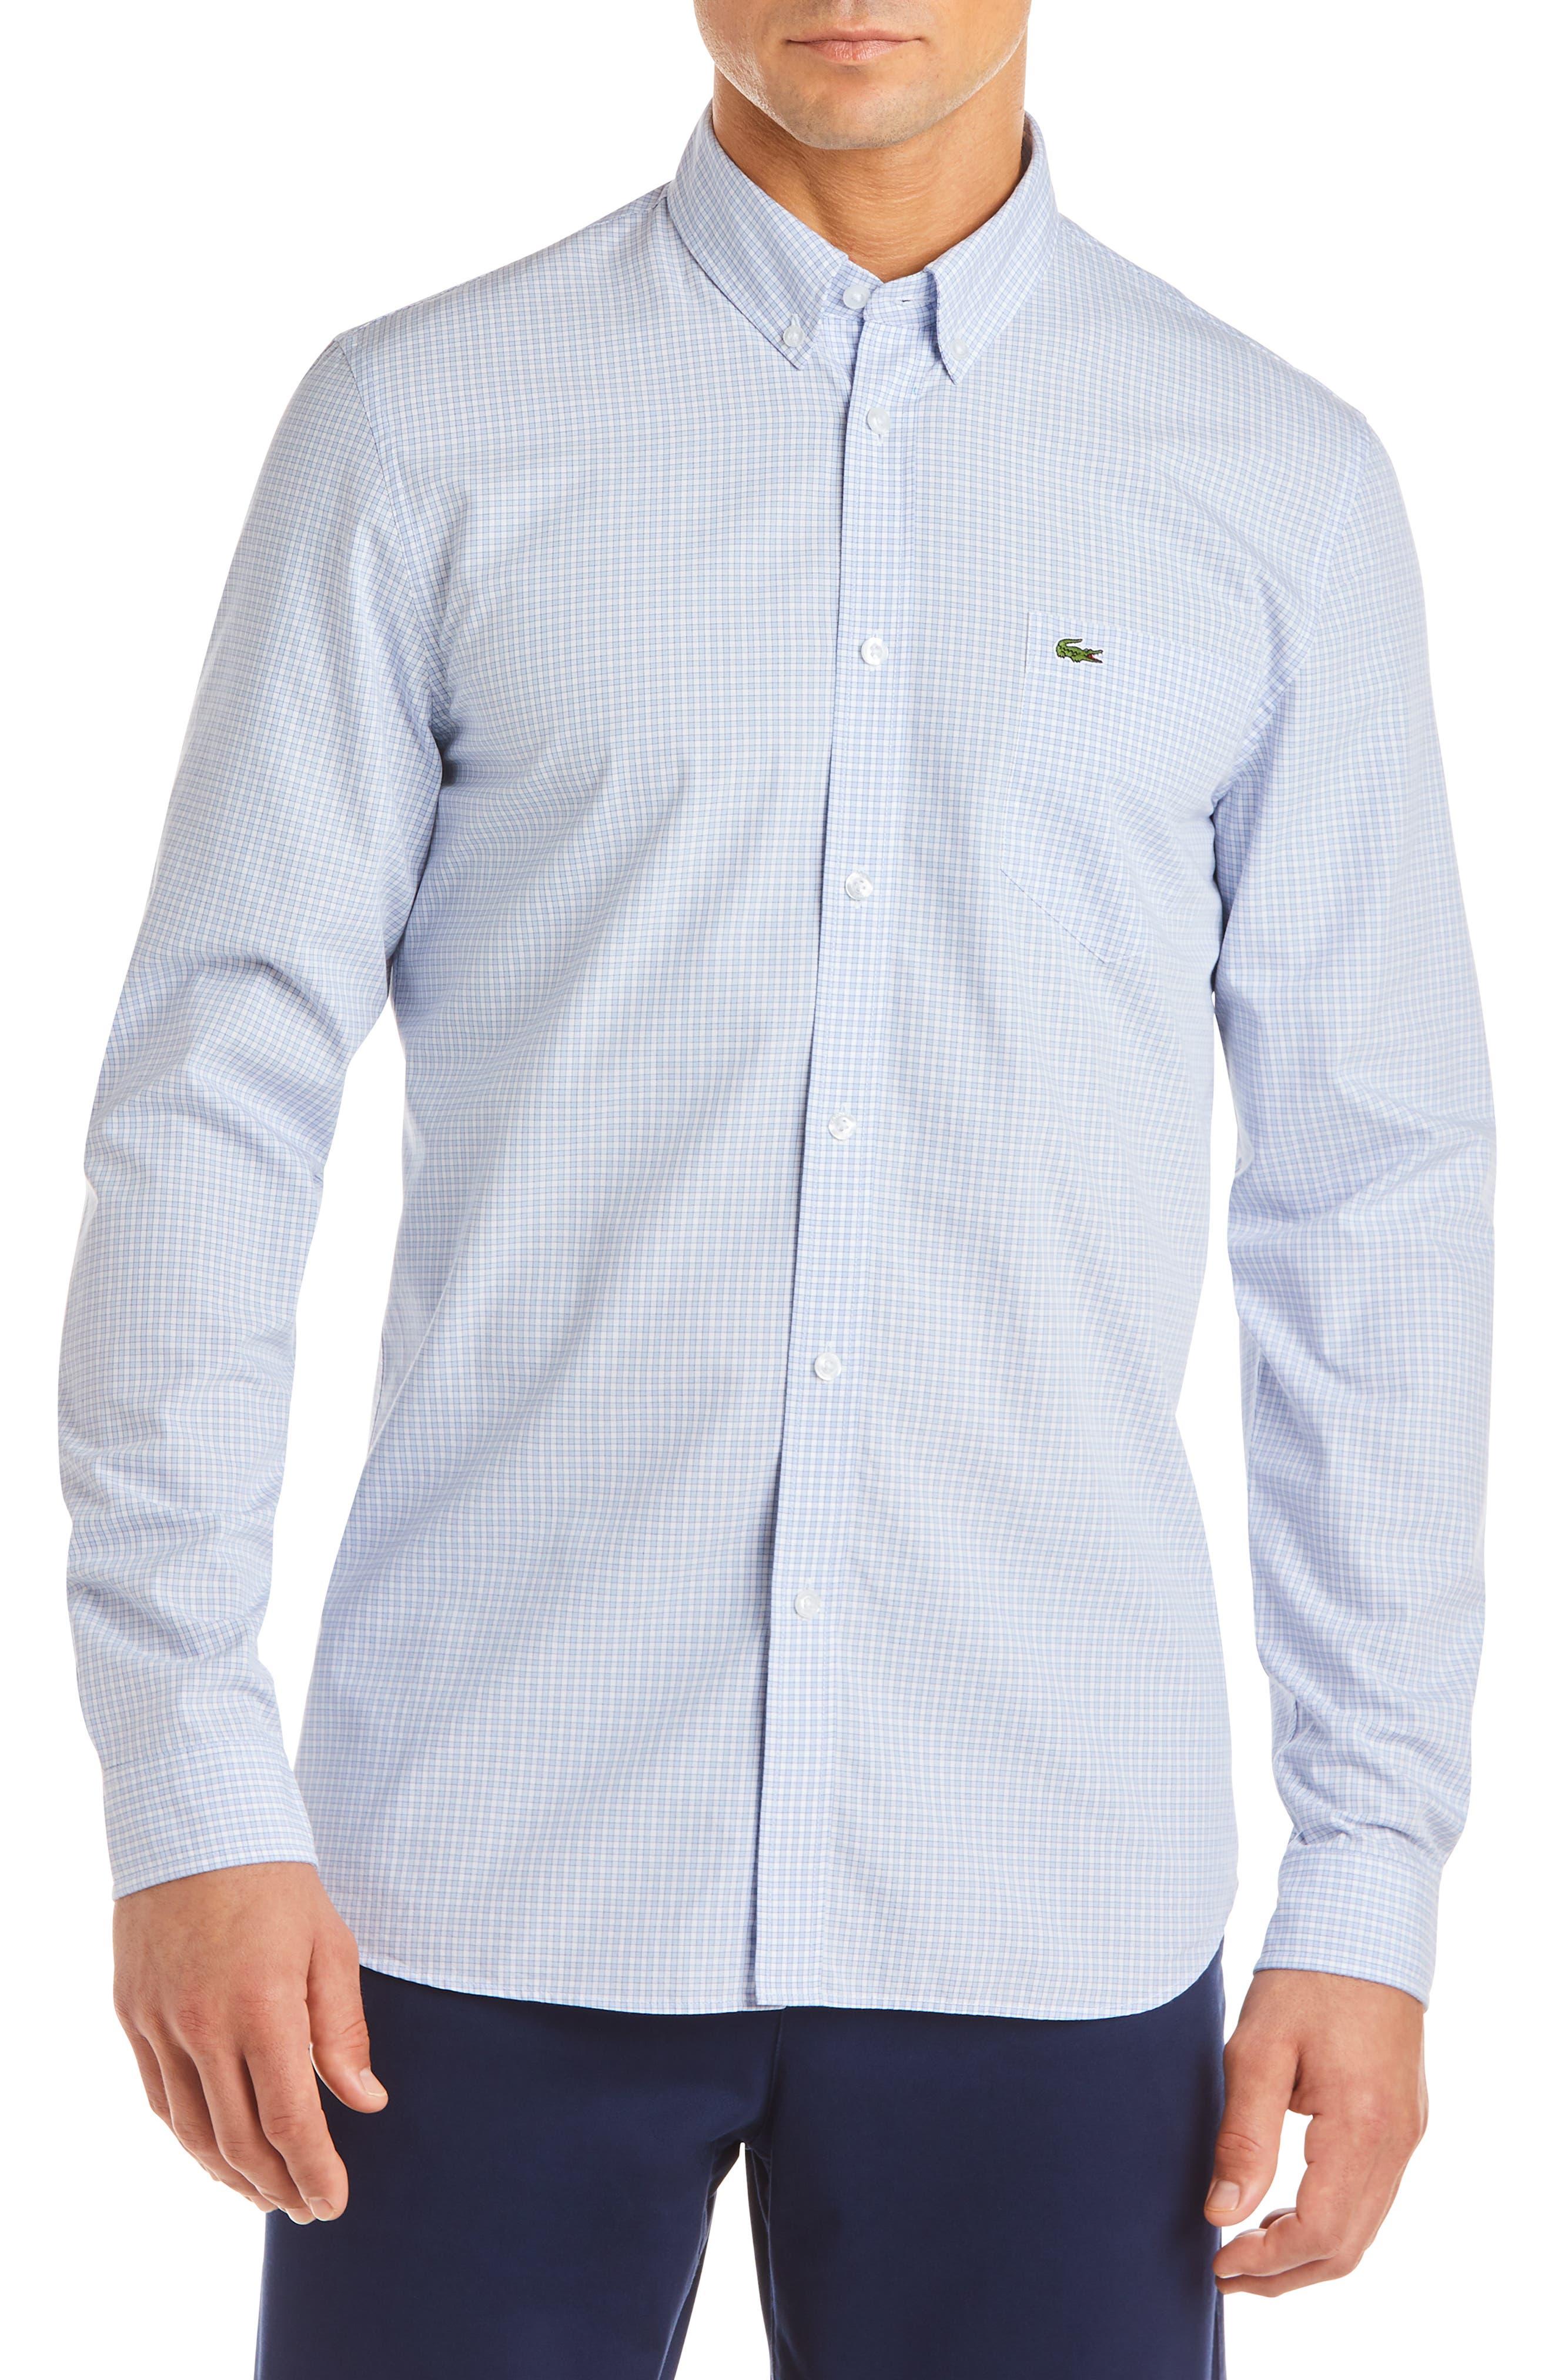 Regular Fit Check Sport Shirt,                             Main thumbnail 1, color,                             IODINE/ WHITE